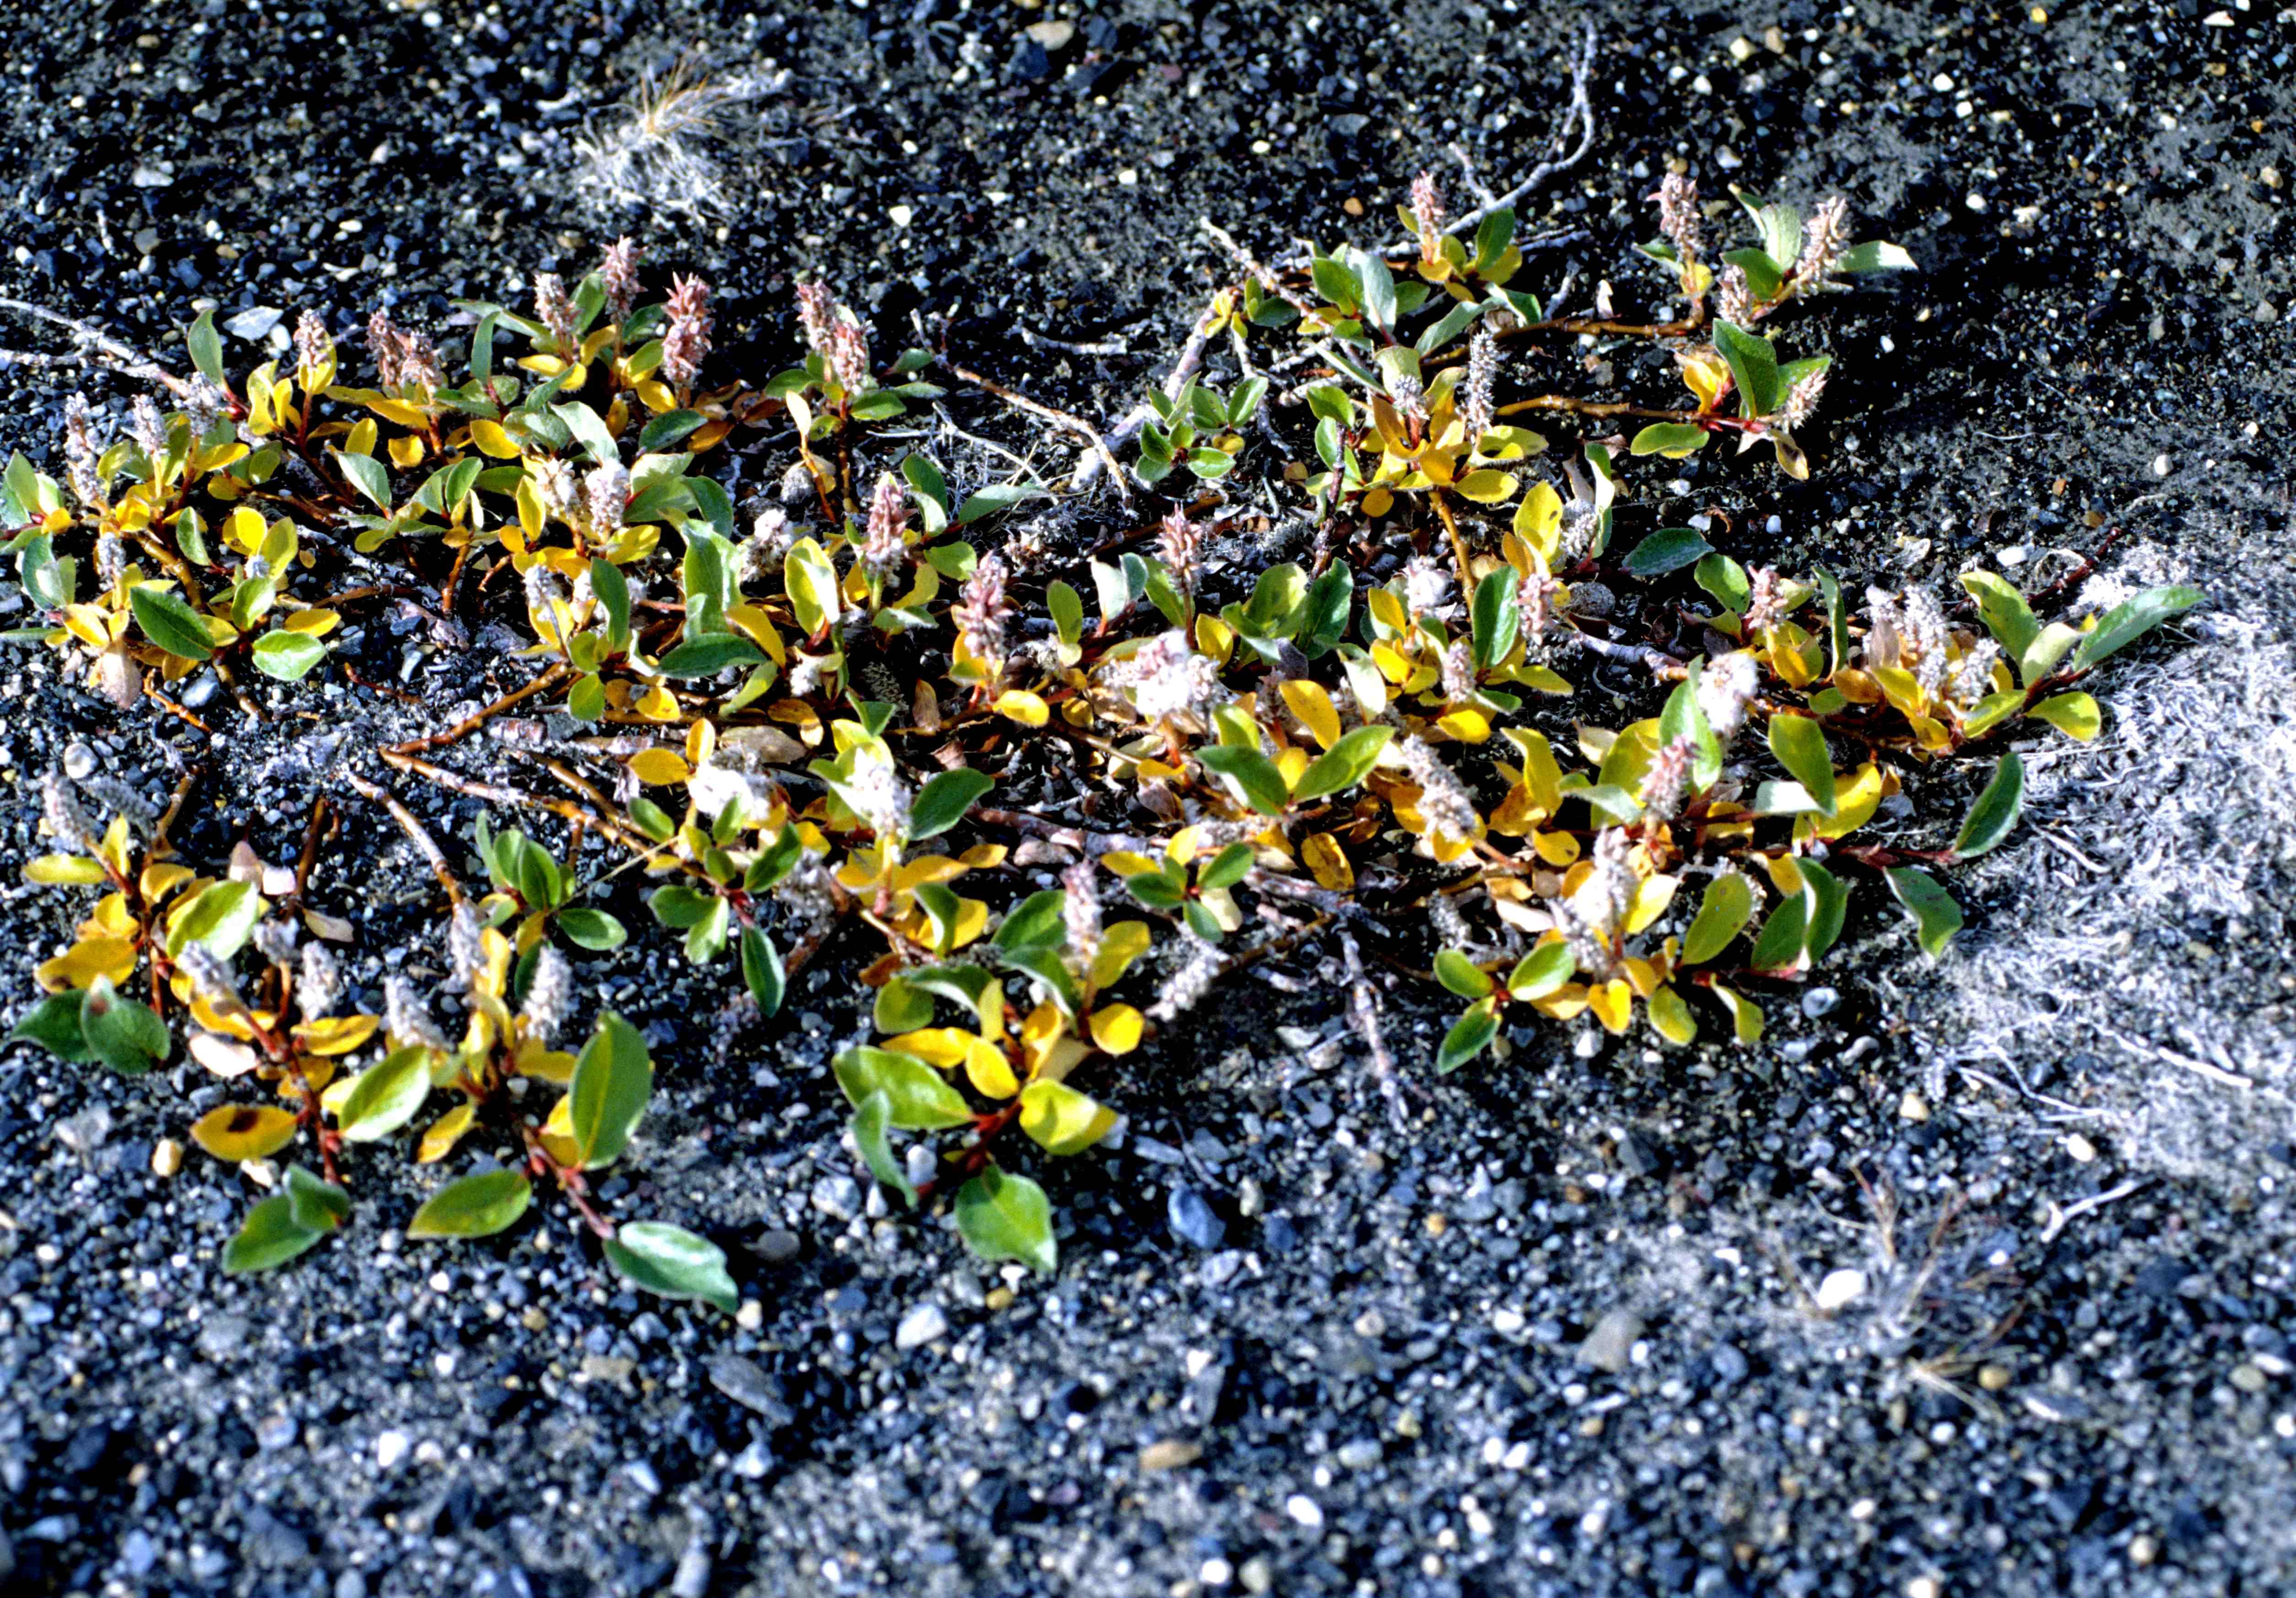 Salix arctica videos